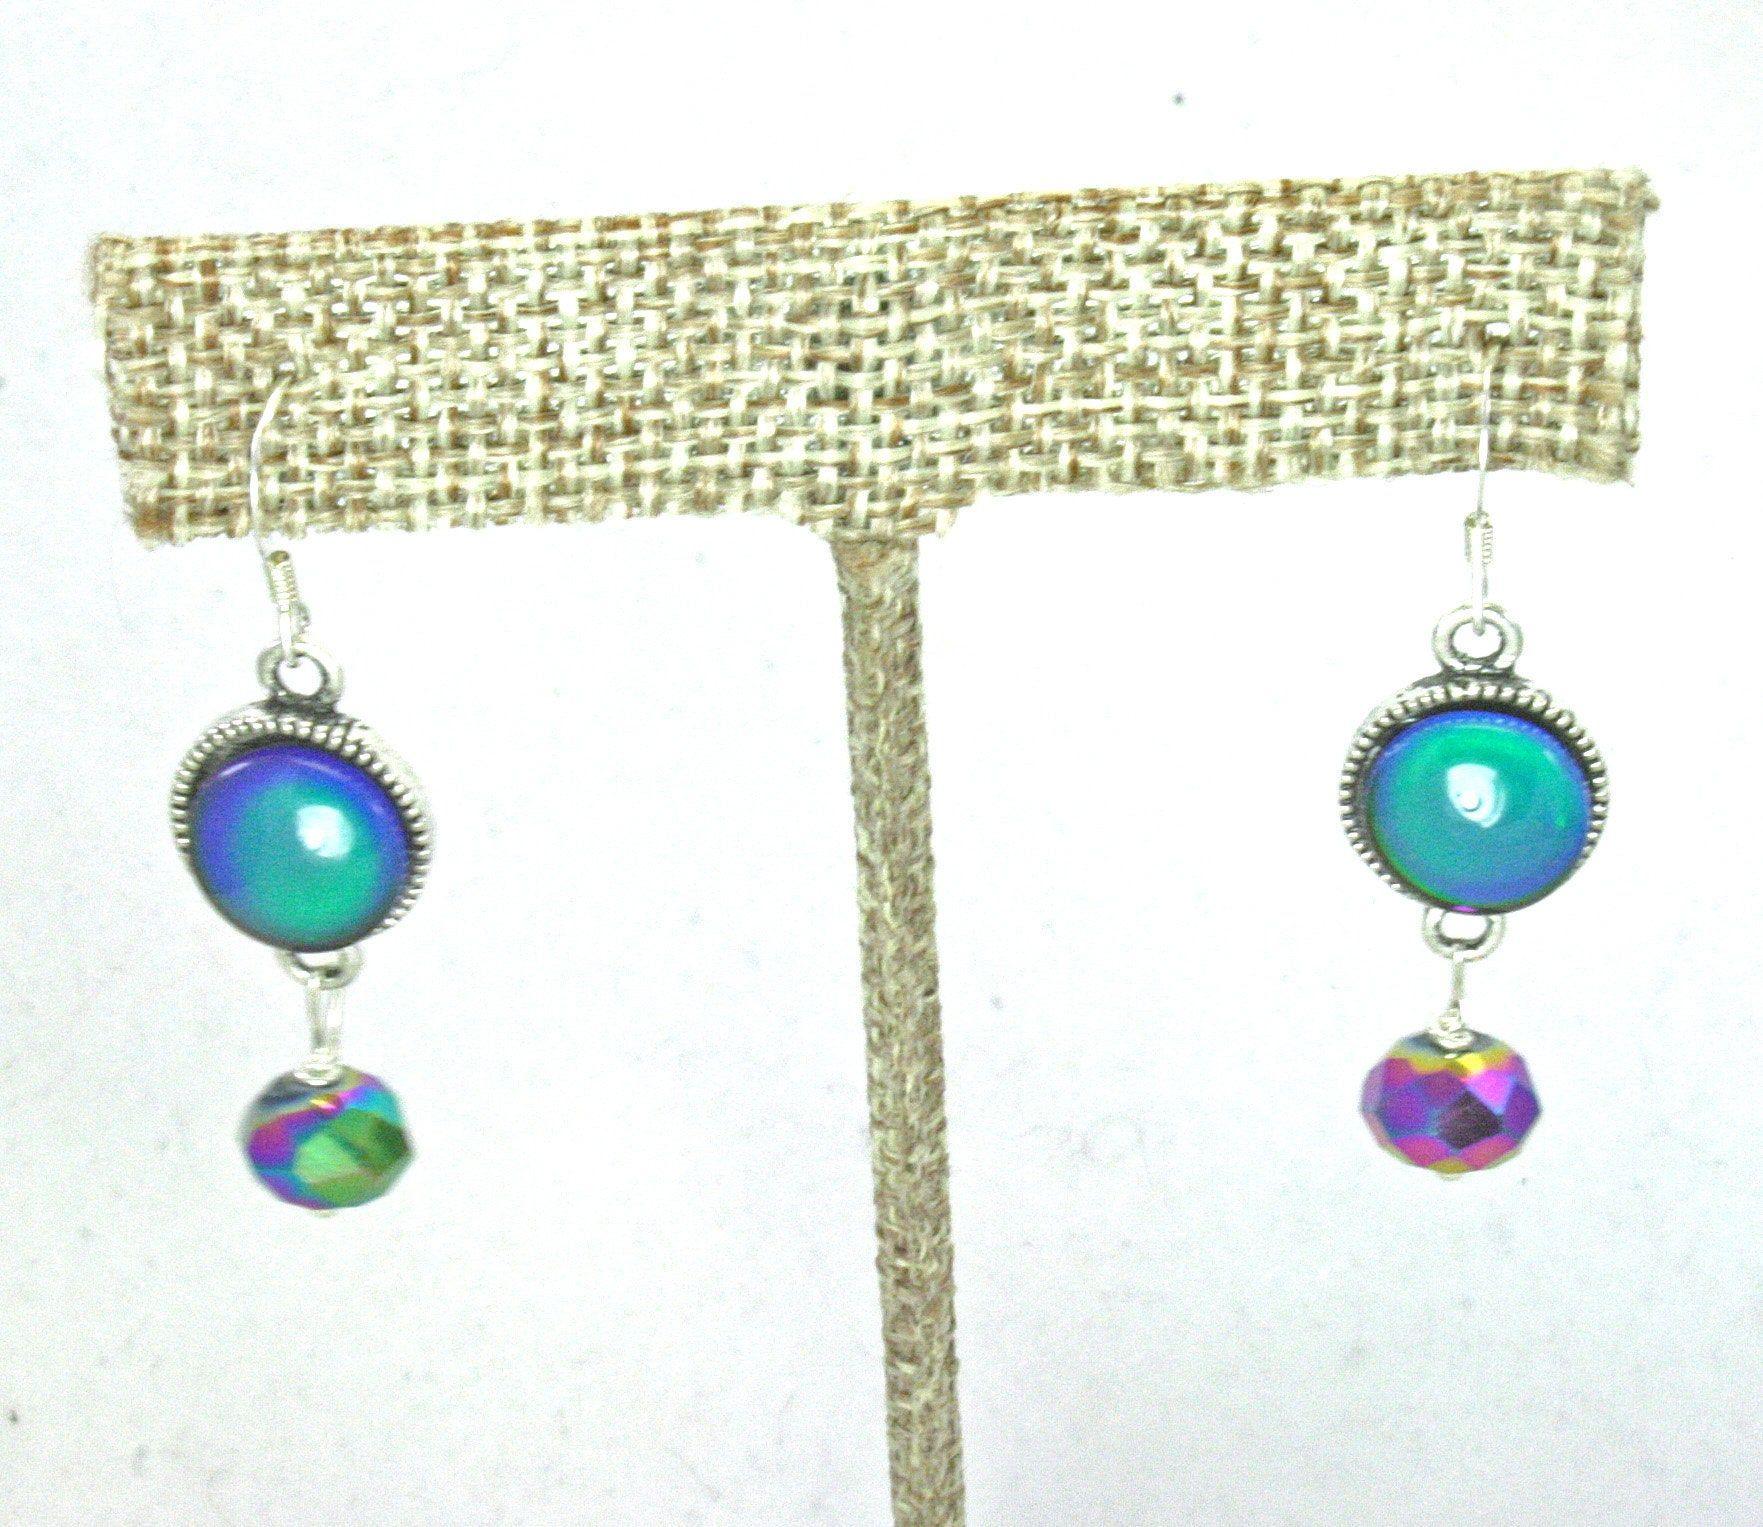 Vintage Peacock Green Cross Dainty Wrap Bangle Bracelet with Crystal Earrings